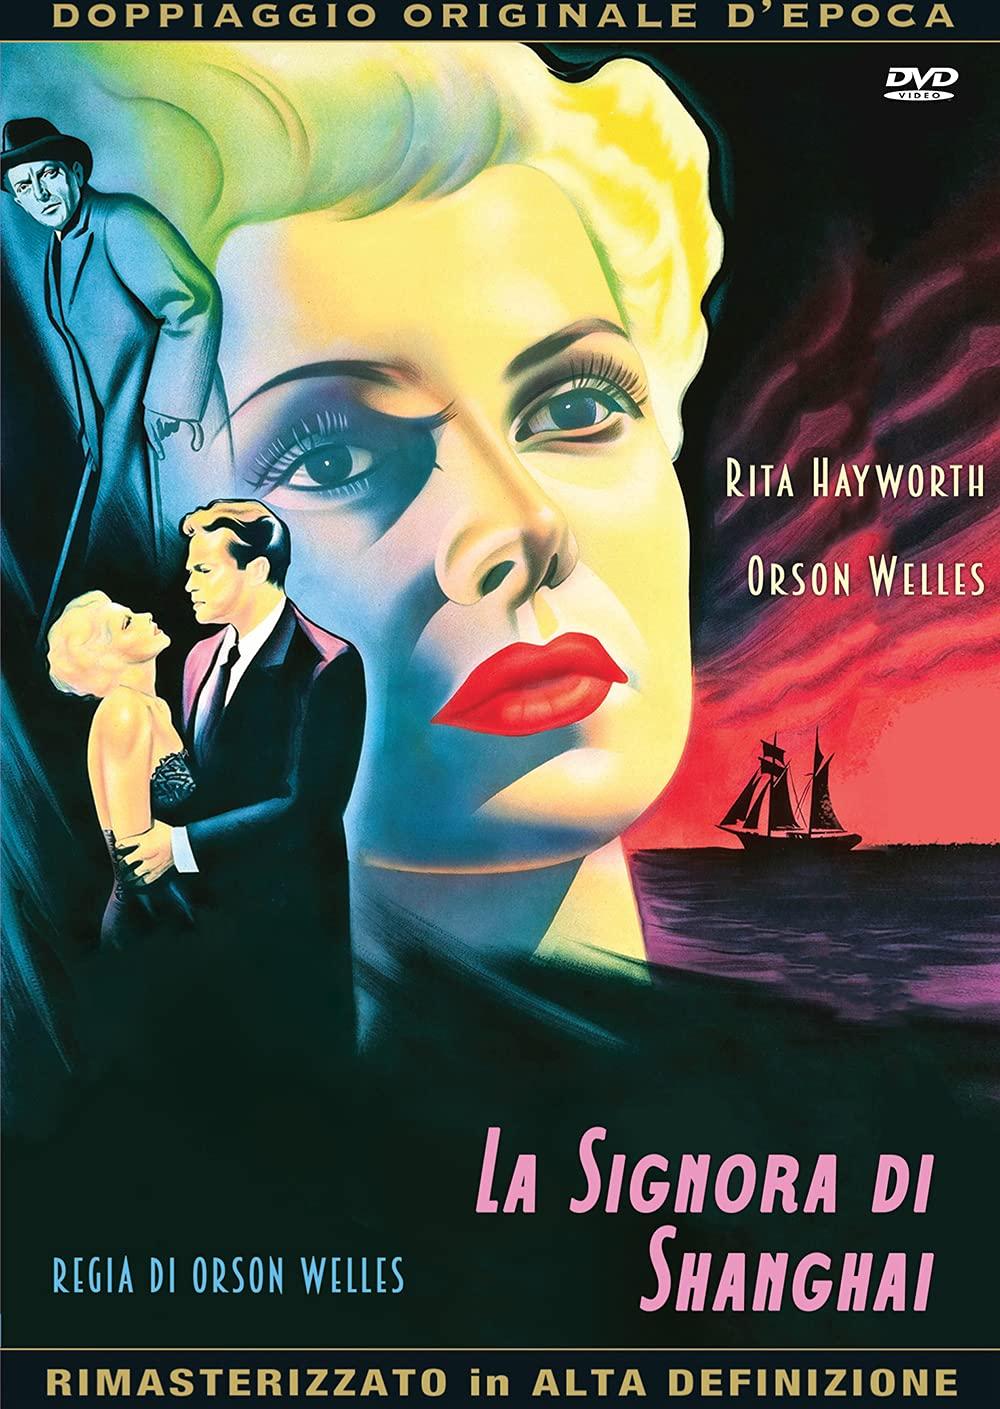 LA SIGNORA DI SHANGHAI (DVD)